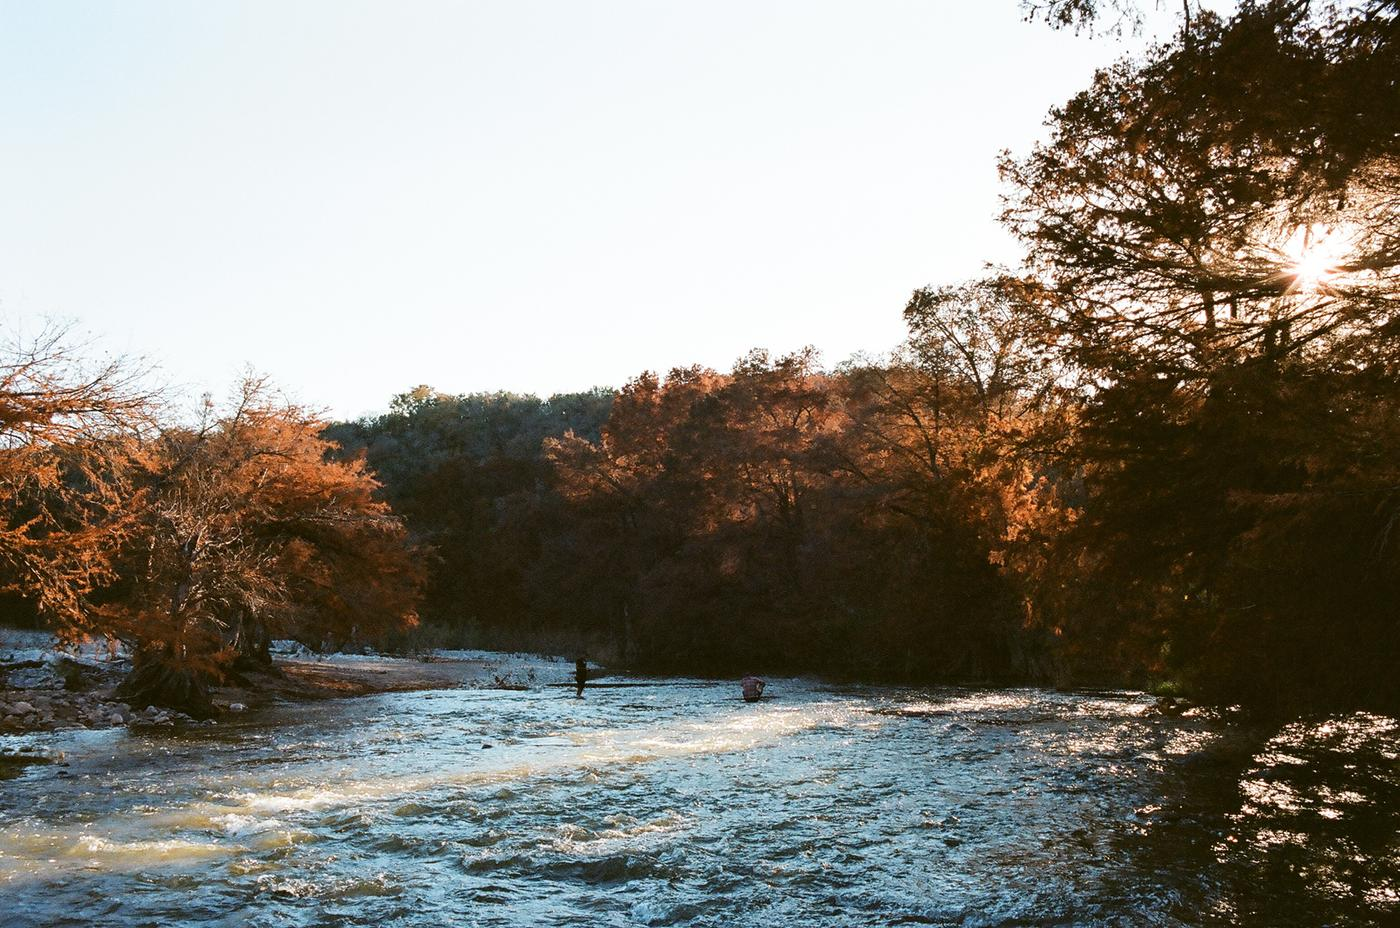 The Pedernales River